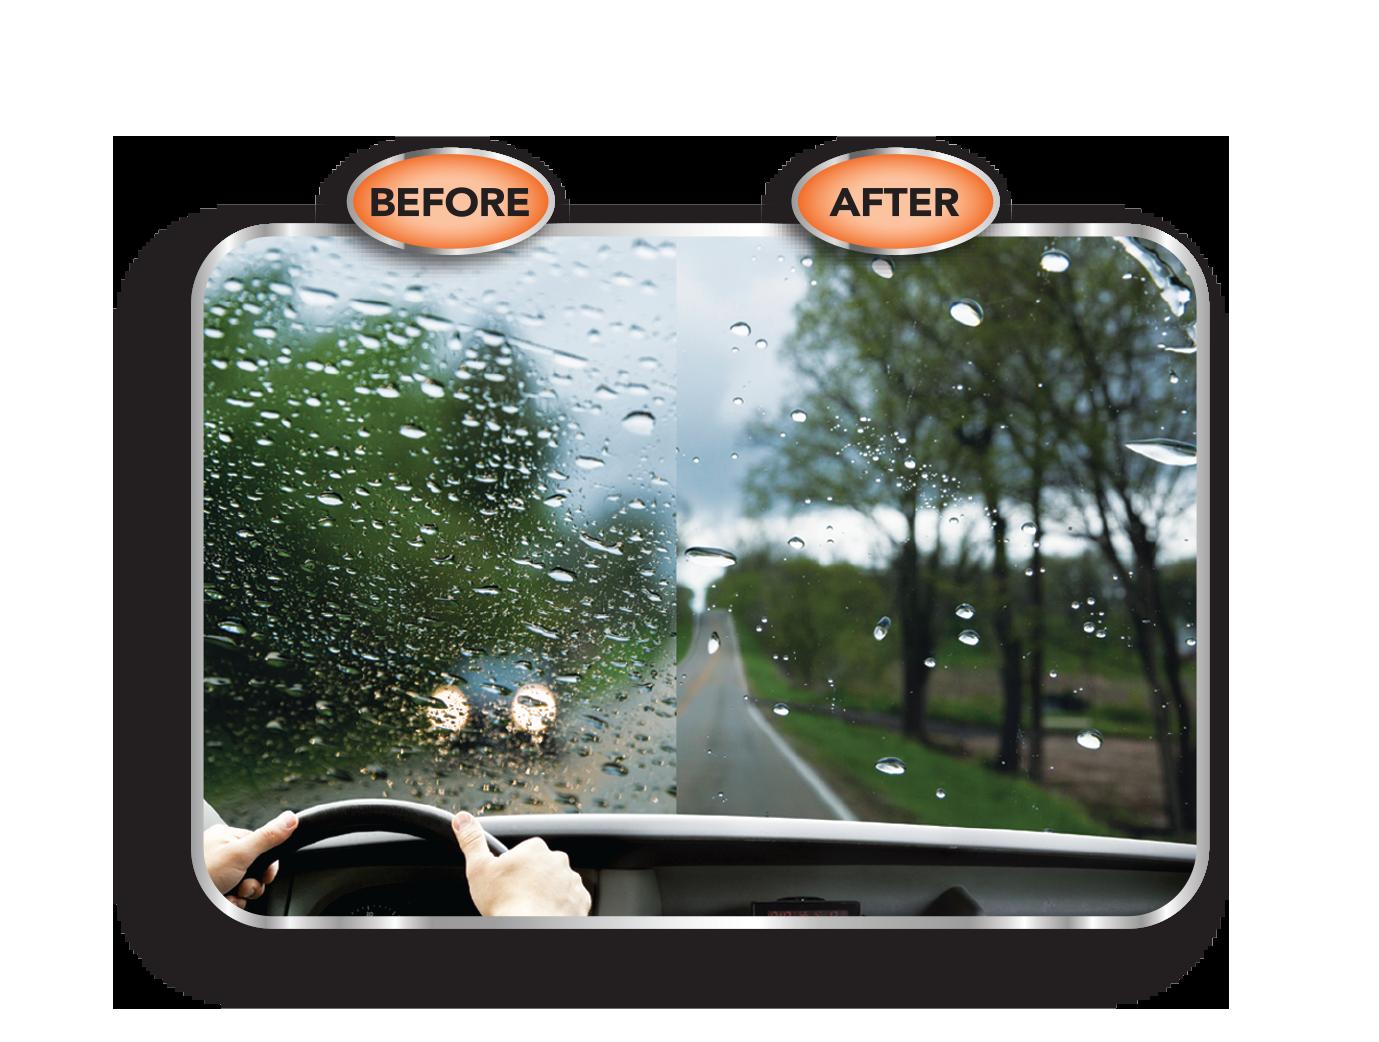 Amazon Rust Oleum 311196 Wipe New Rainbrella Automotive